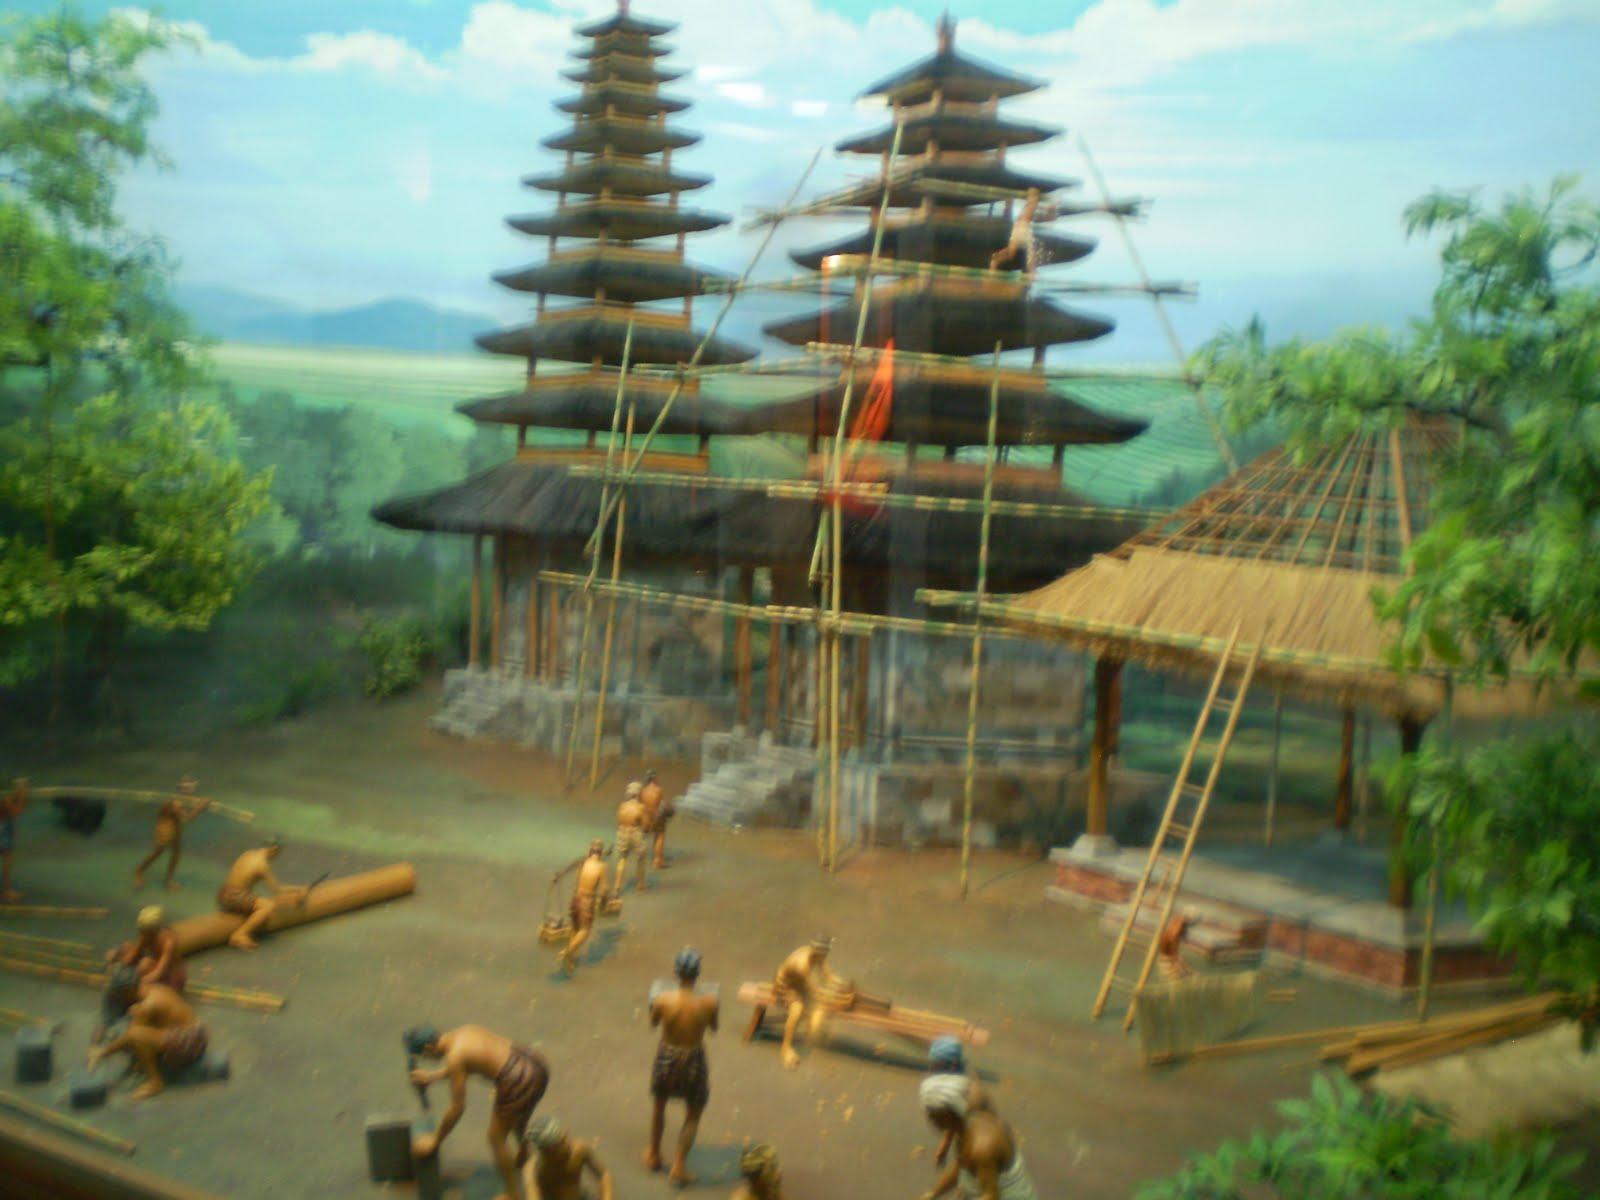 Pemecutan Bedulu Majapahit Sejarah Kerajaan Bedulu New